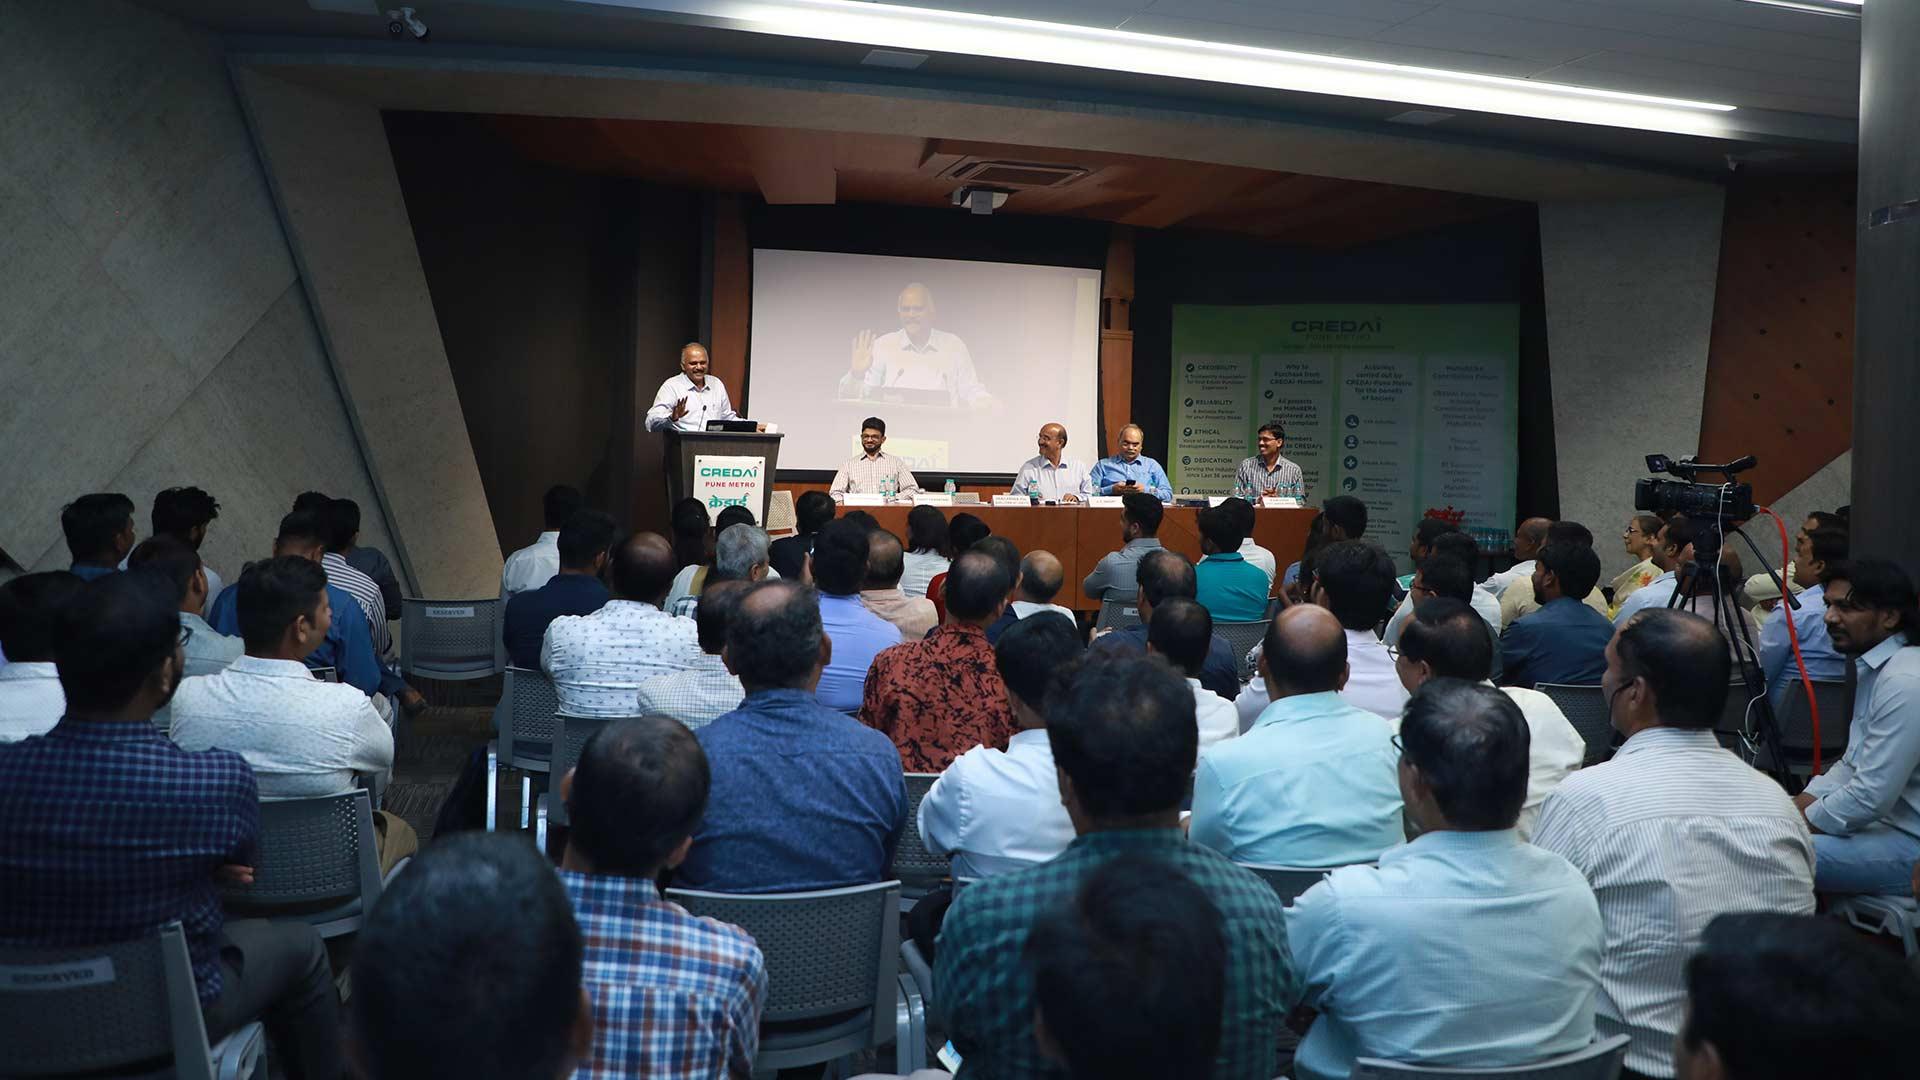 Contractor's Awareness Program reg. Labour Registration under BOCW and Labour Welfare Benefits held on 17th June, 2019 at CREDAI-Pune Metro Auditorium